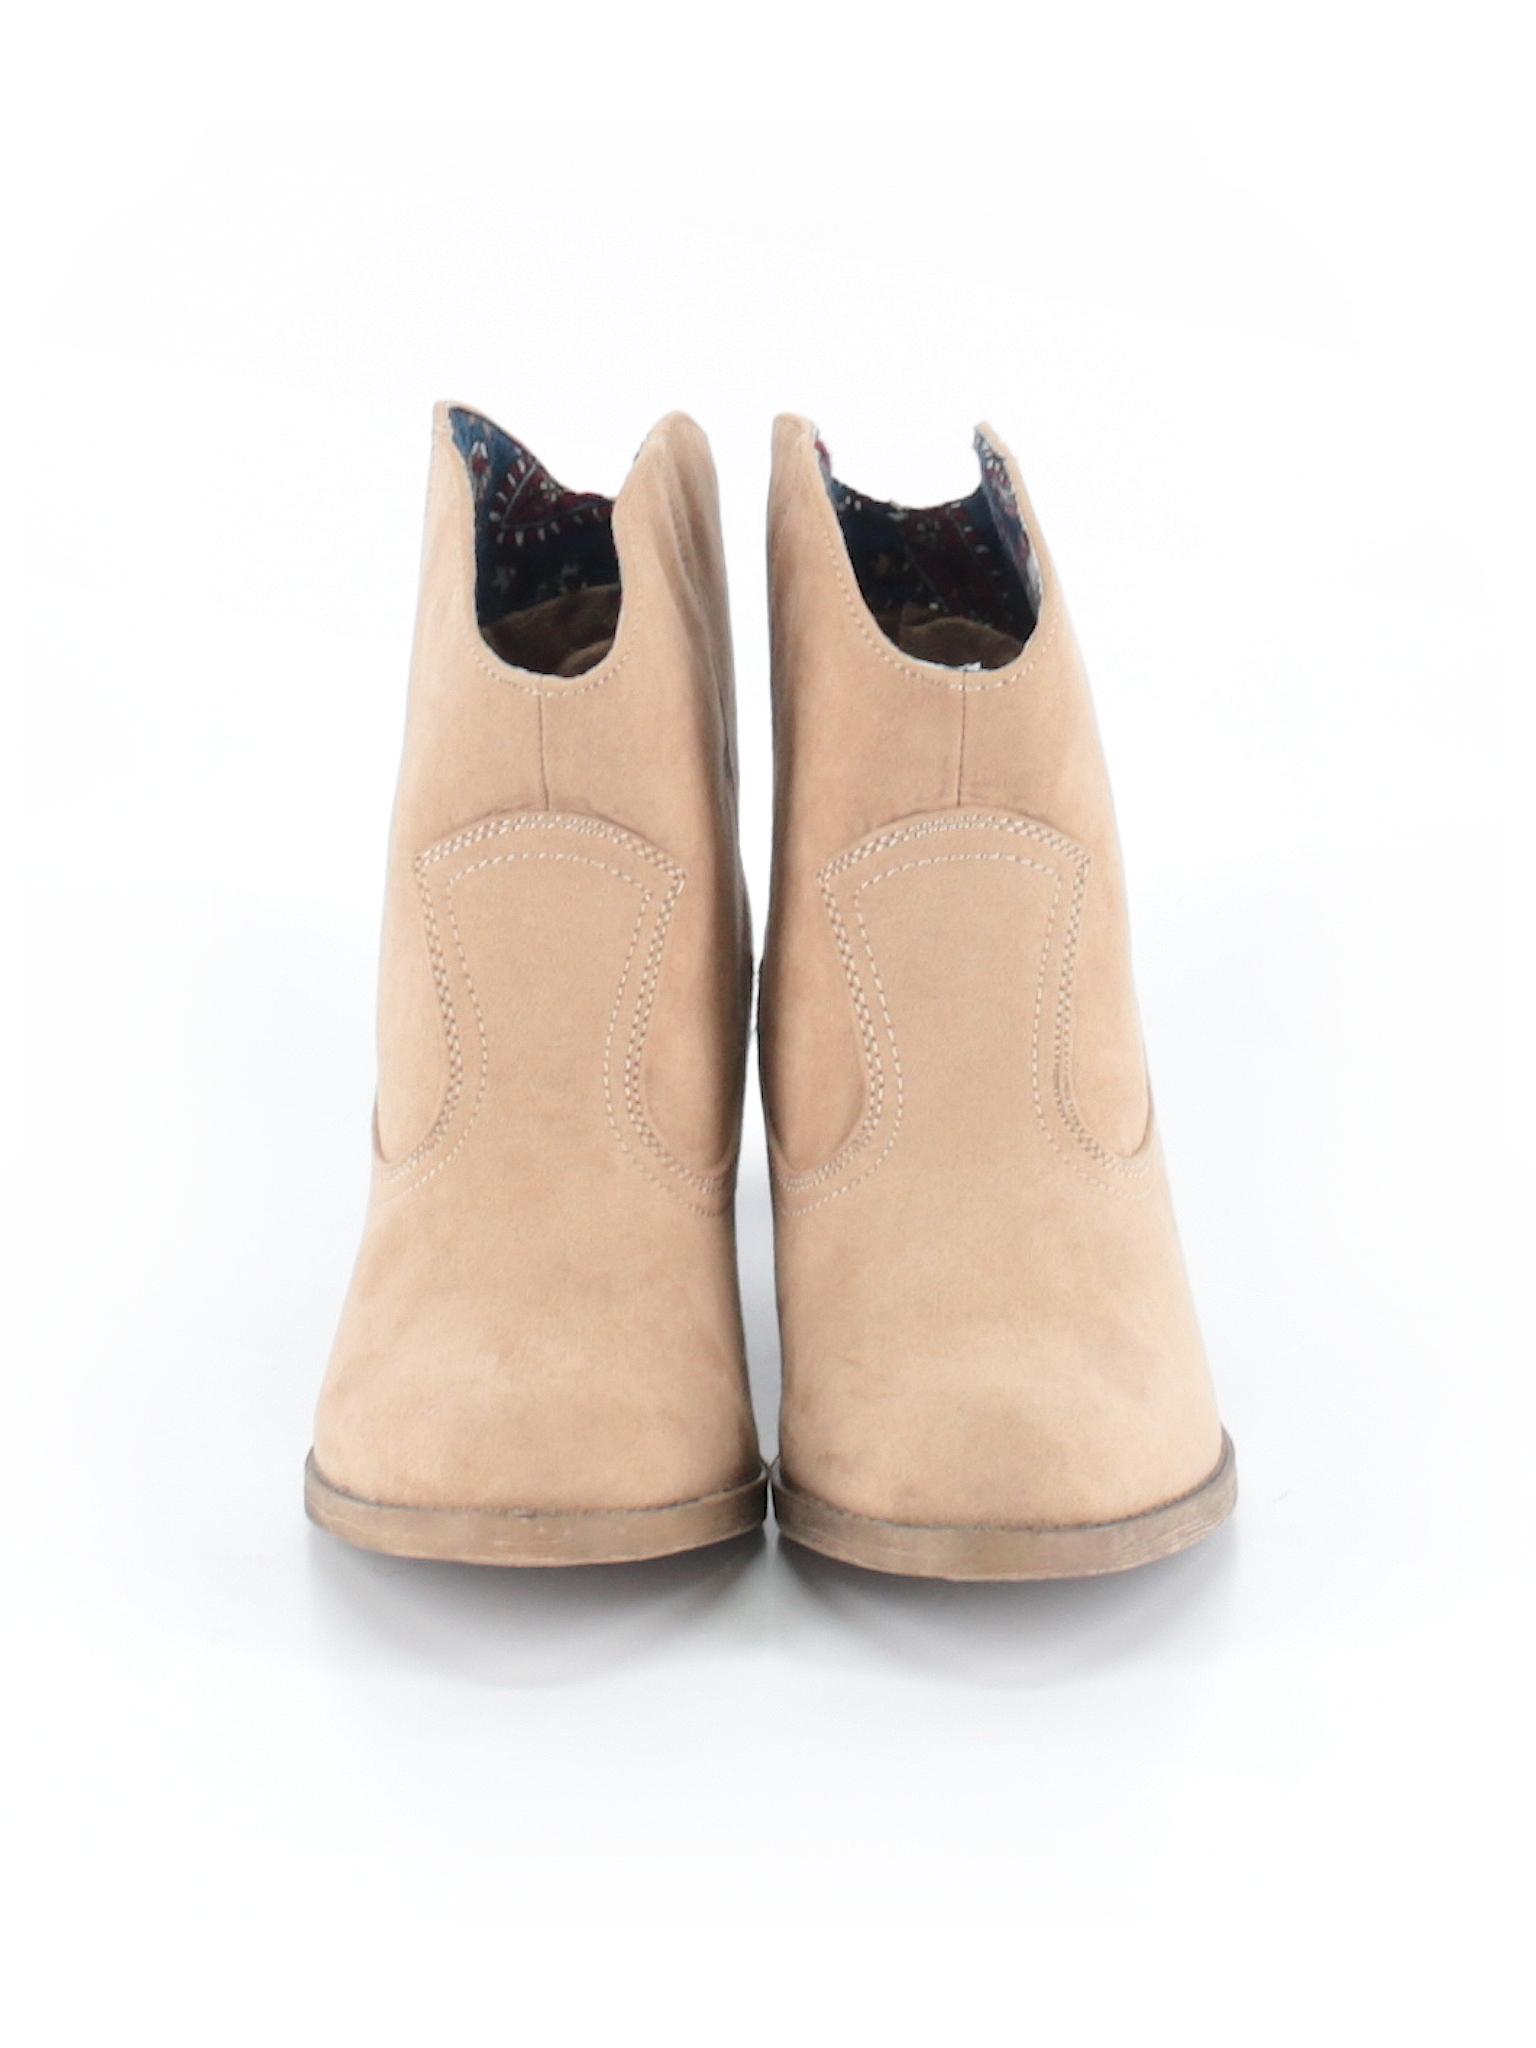 Boots Boutique Ankle promotion Dog Rocket w6BxR41qI